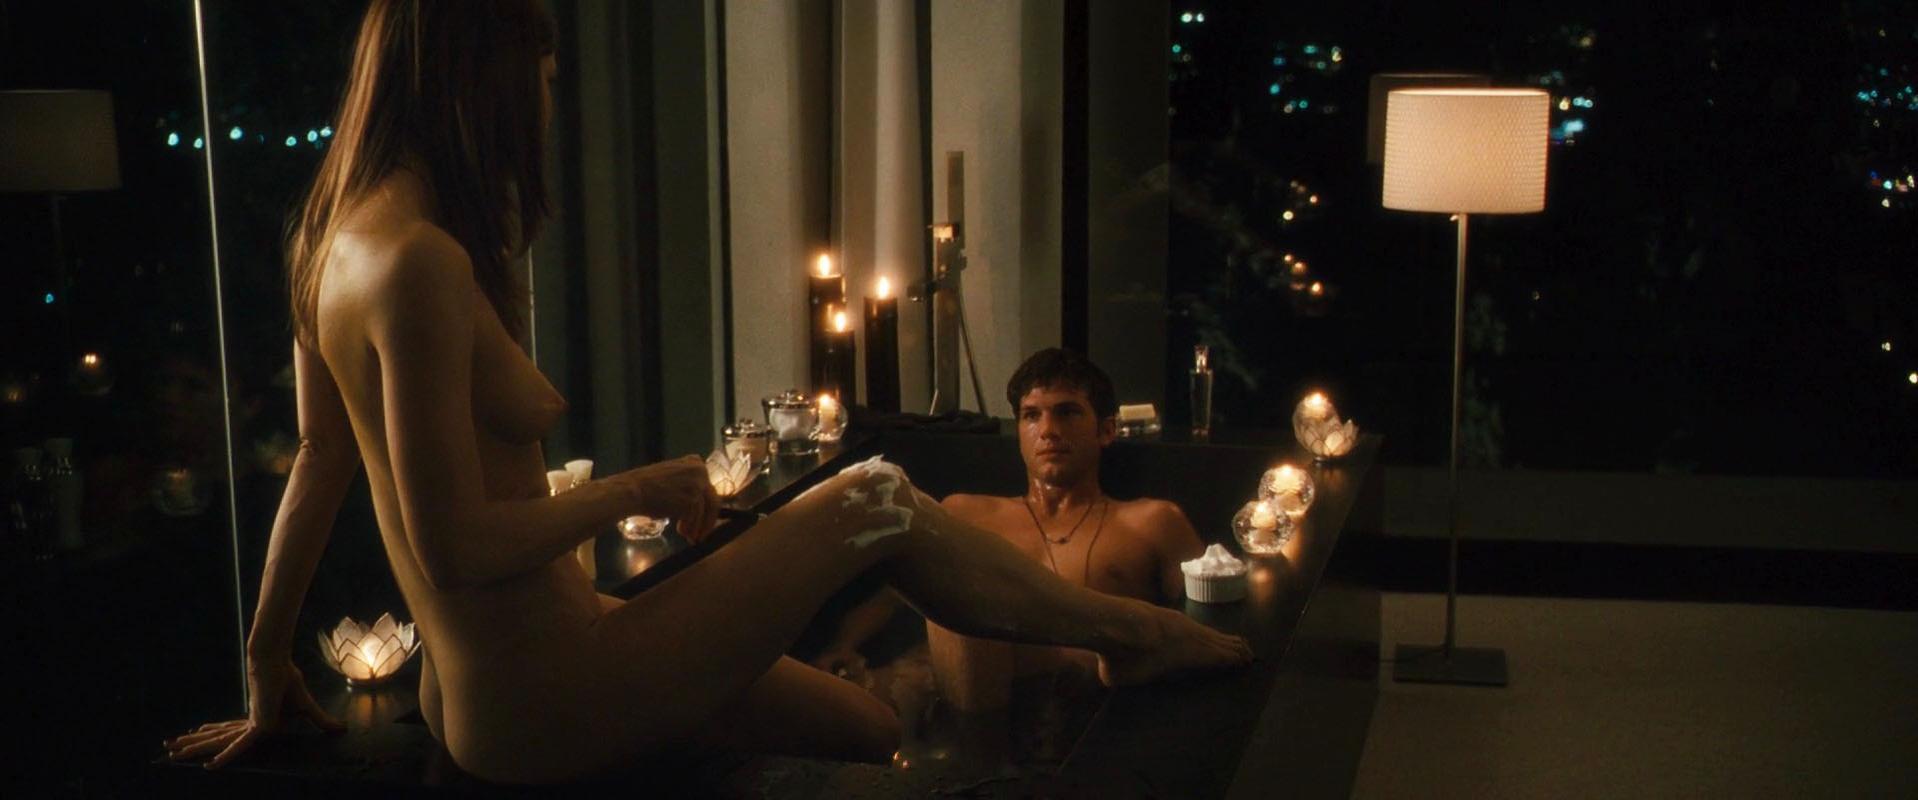 Rachel Blanchard nude - Spread (2009)